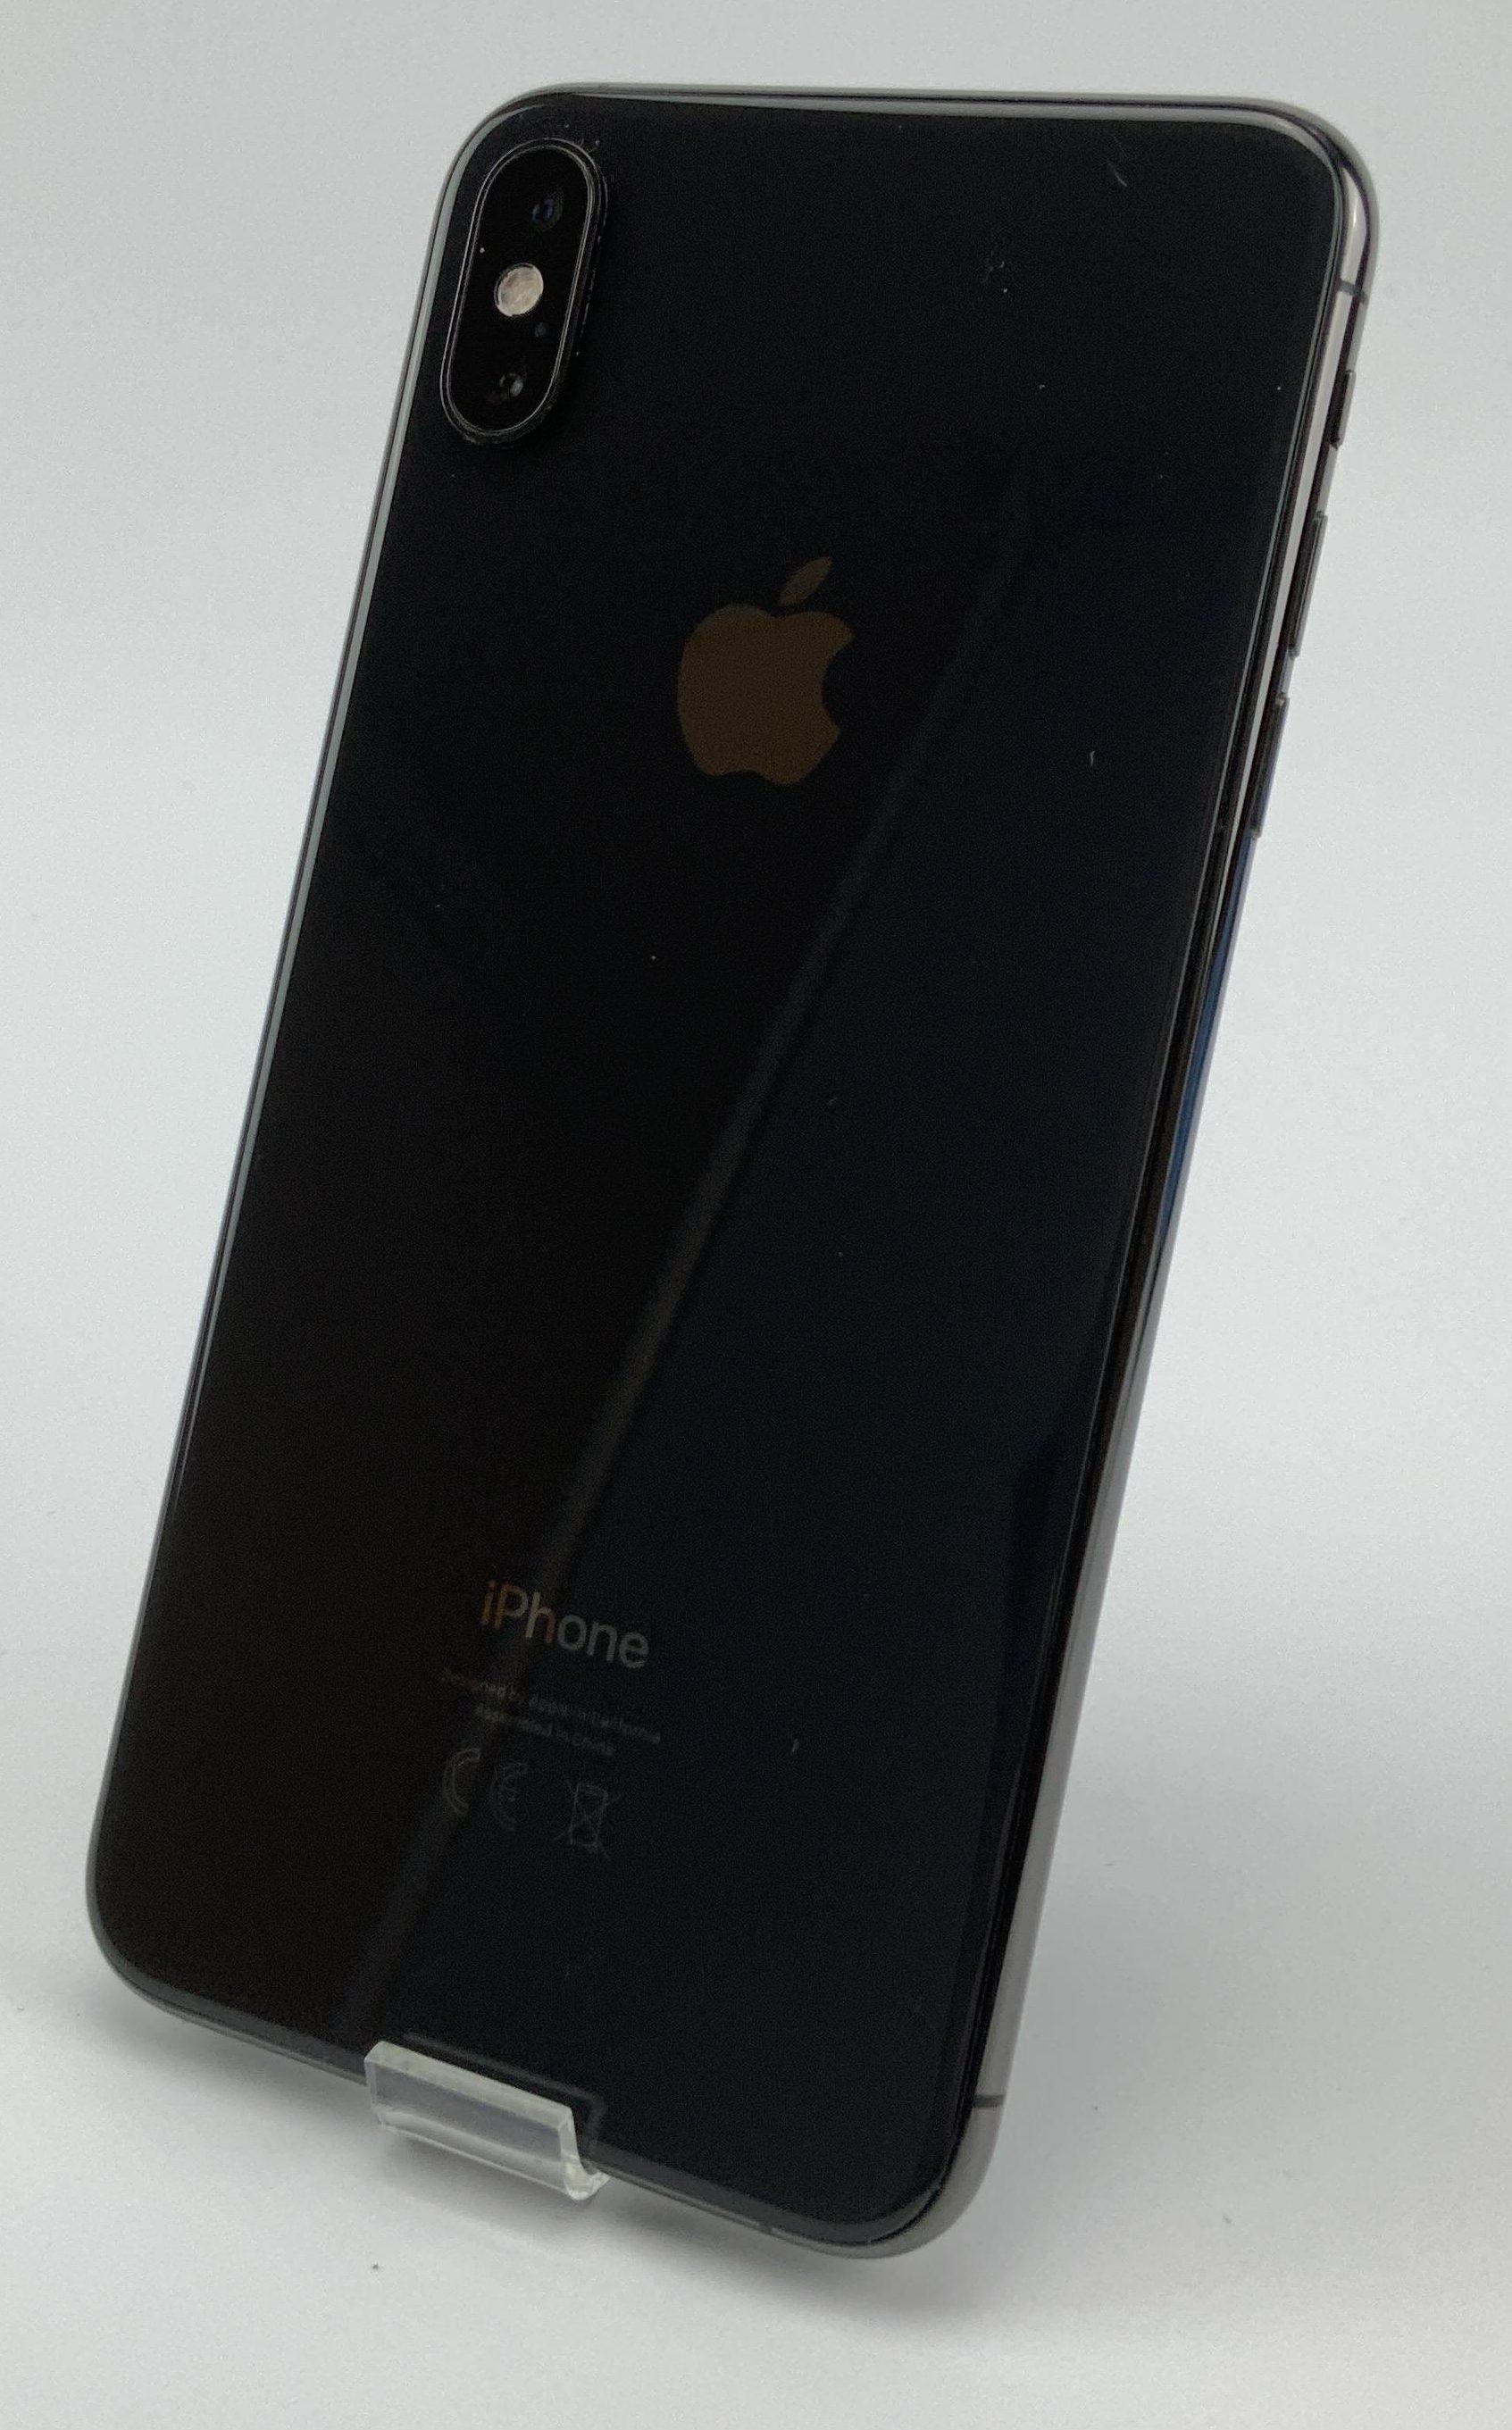 iPhone XS Max 512GB, 512GB, Space Gray, imagen 2